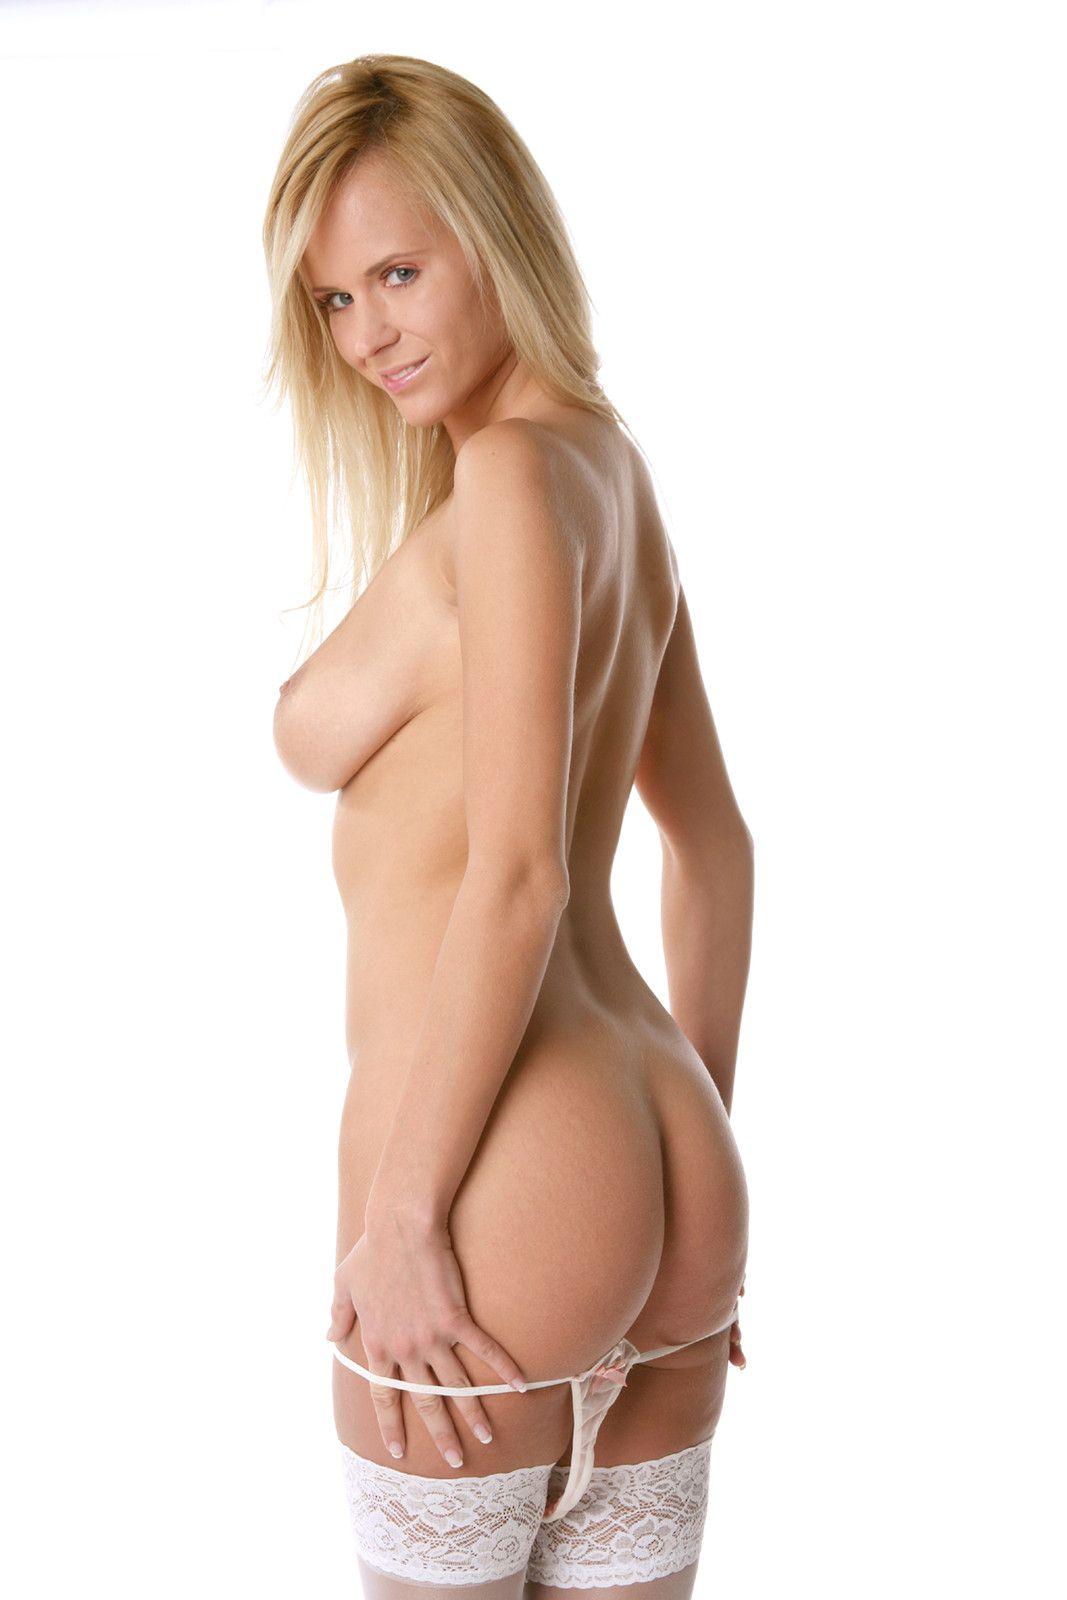 Girl naked farting gallery